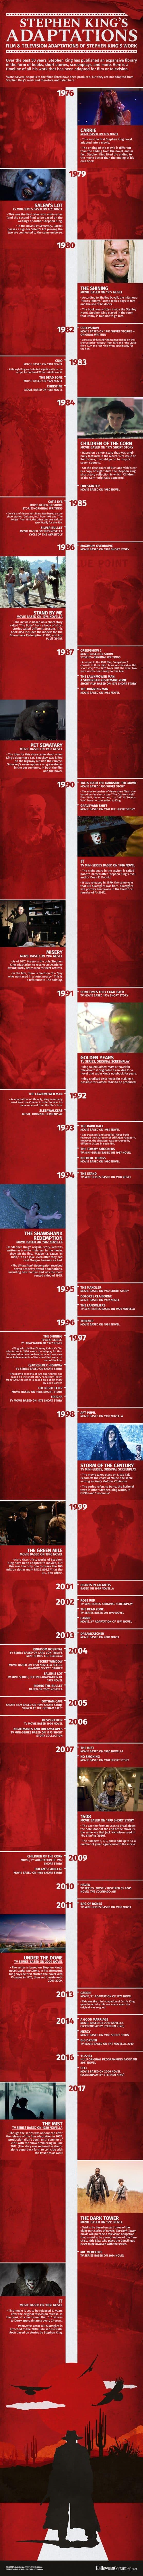 Stephen King movie adaptations